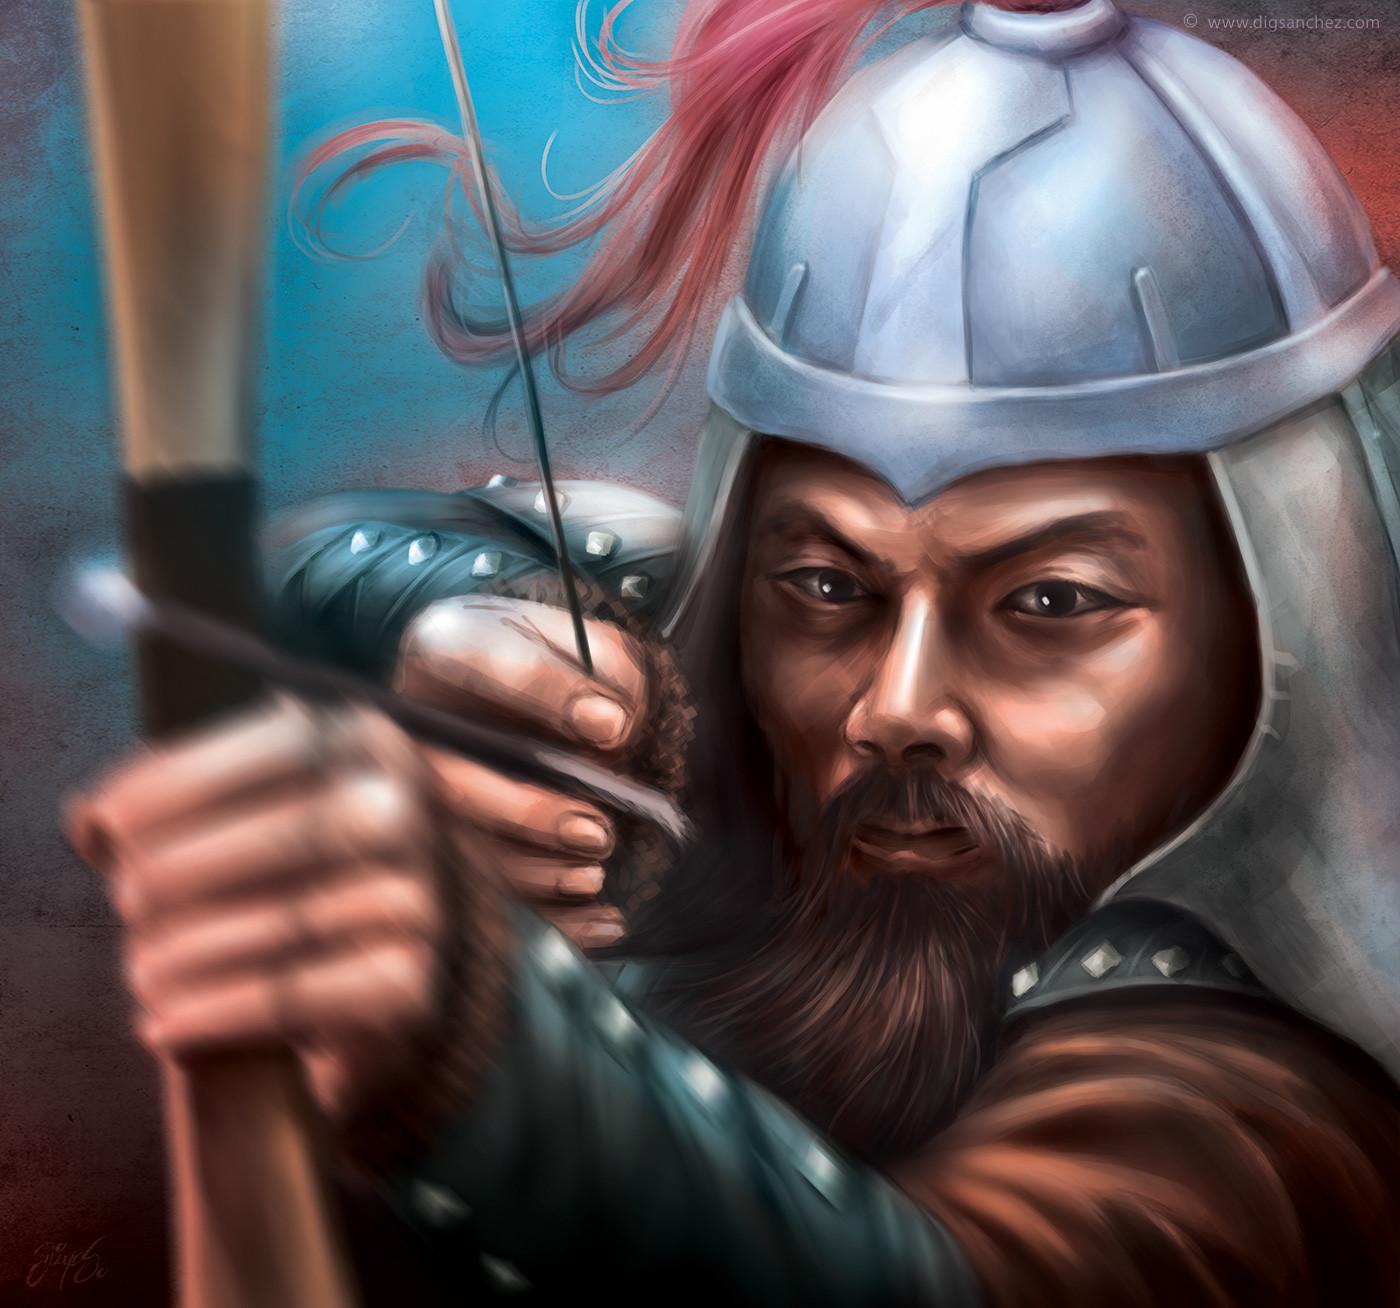 Card character - Genghis Khan